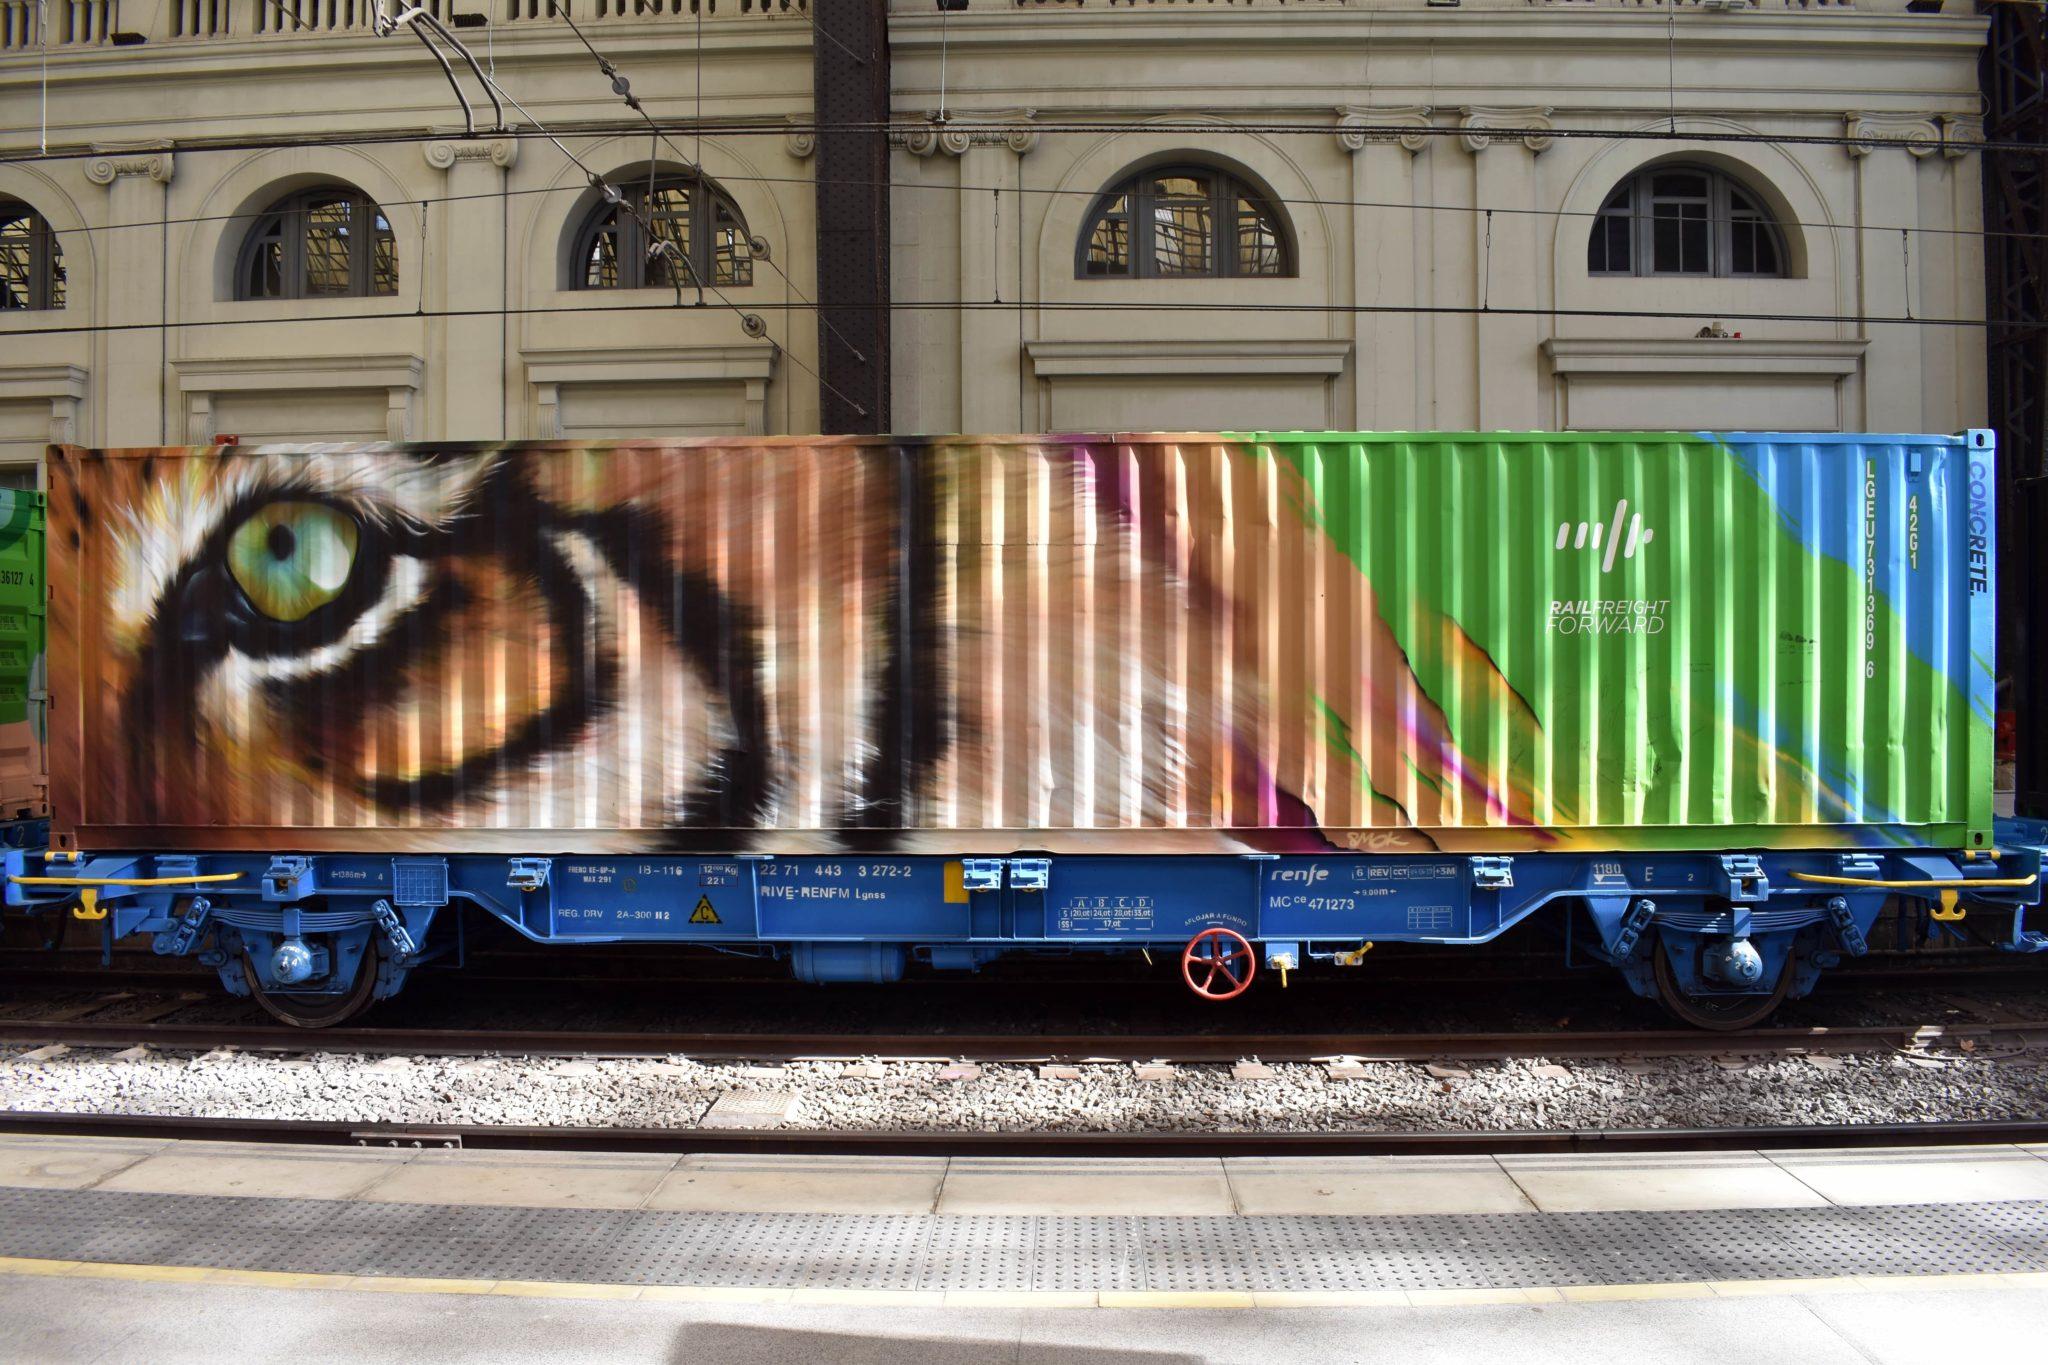 Sedr84 Noah's train street art